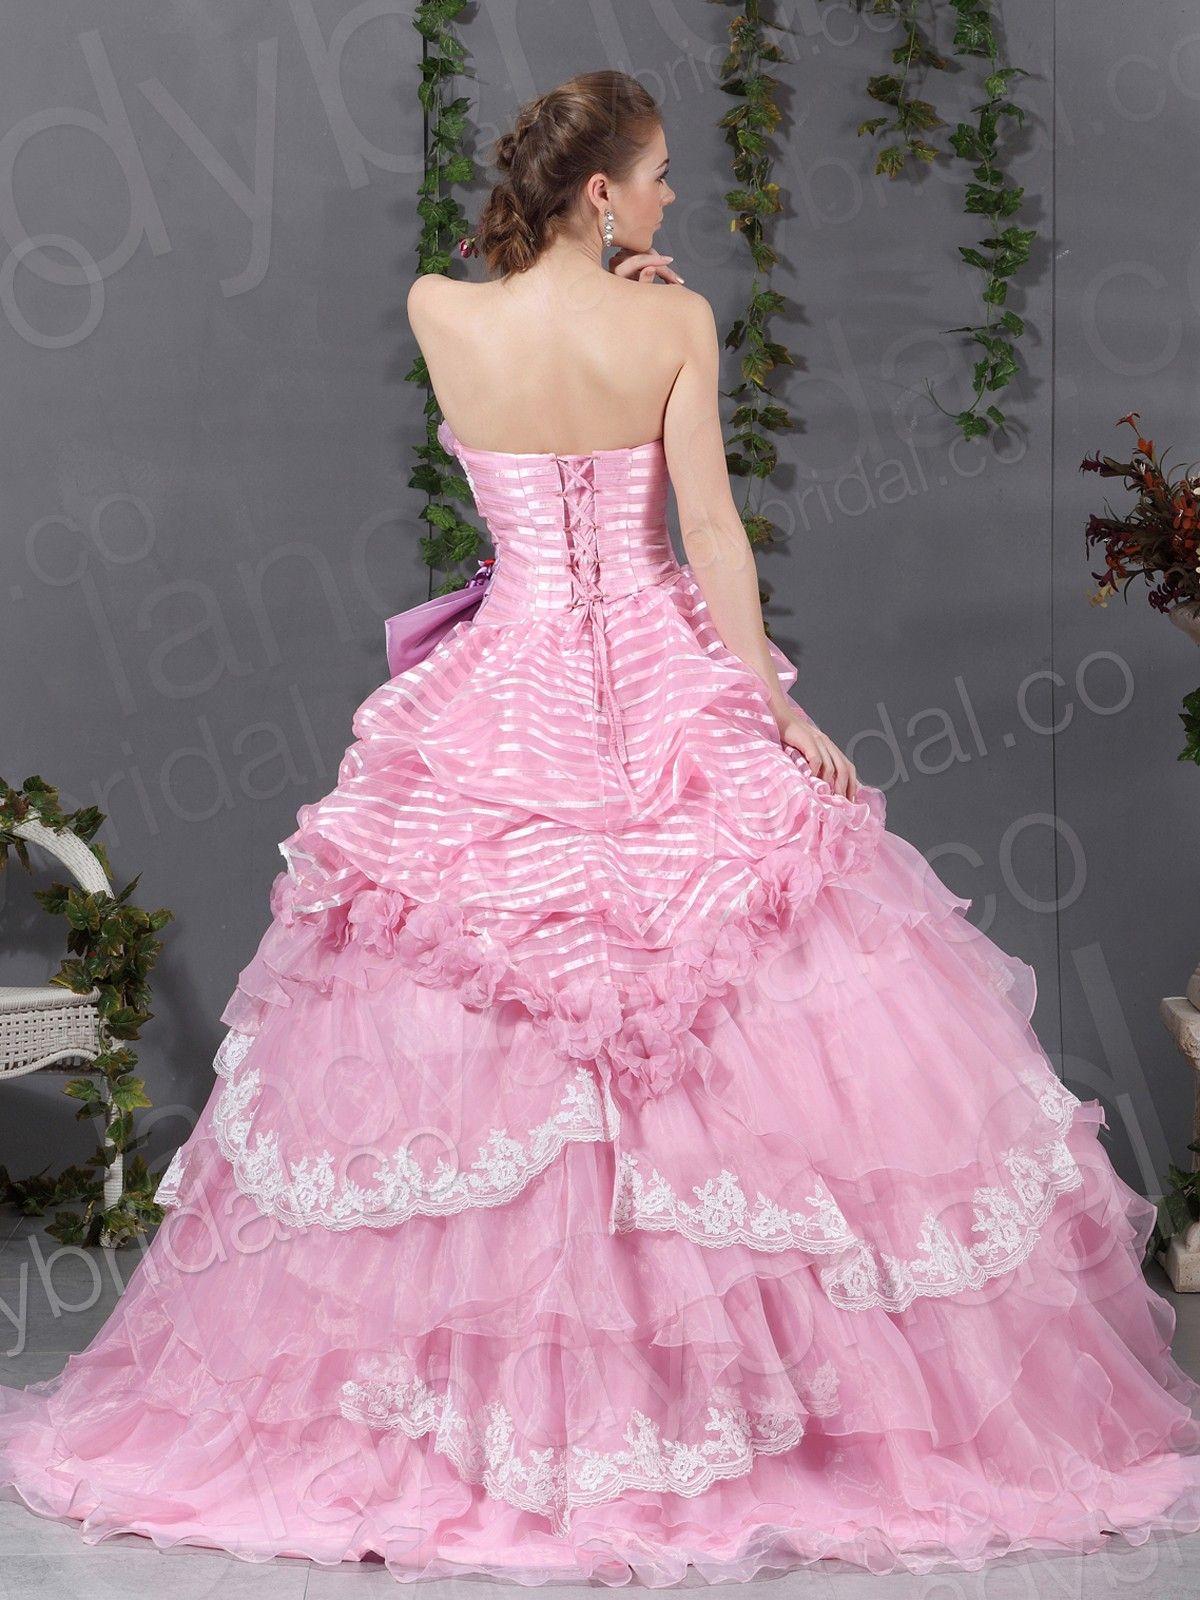 Pink chapel train organza strapless ball gown wedding dress b